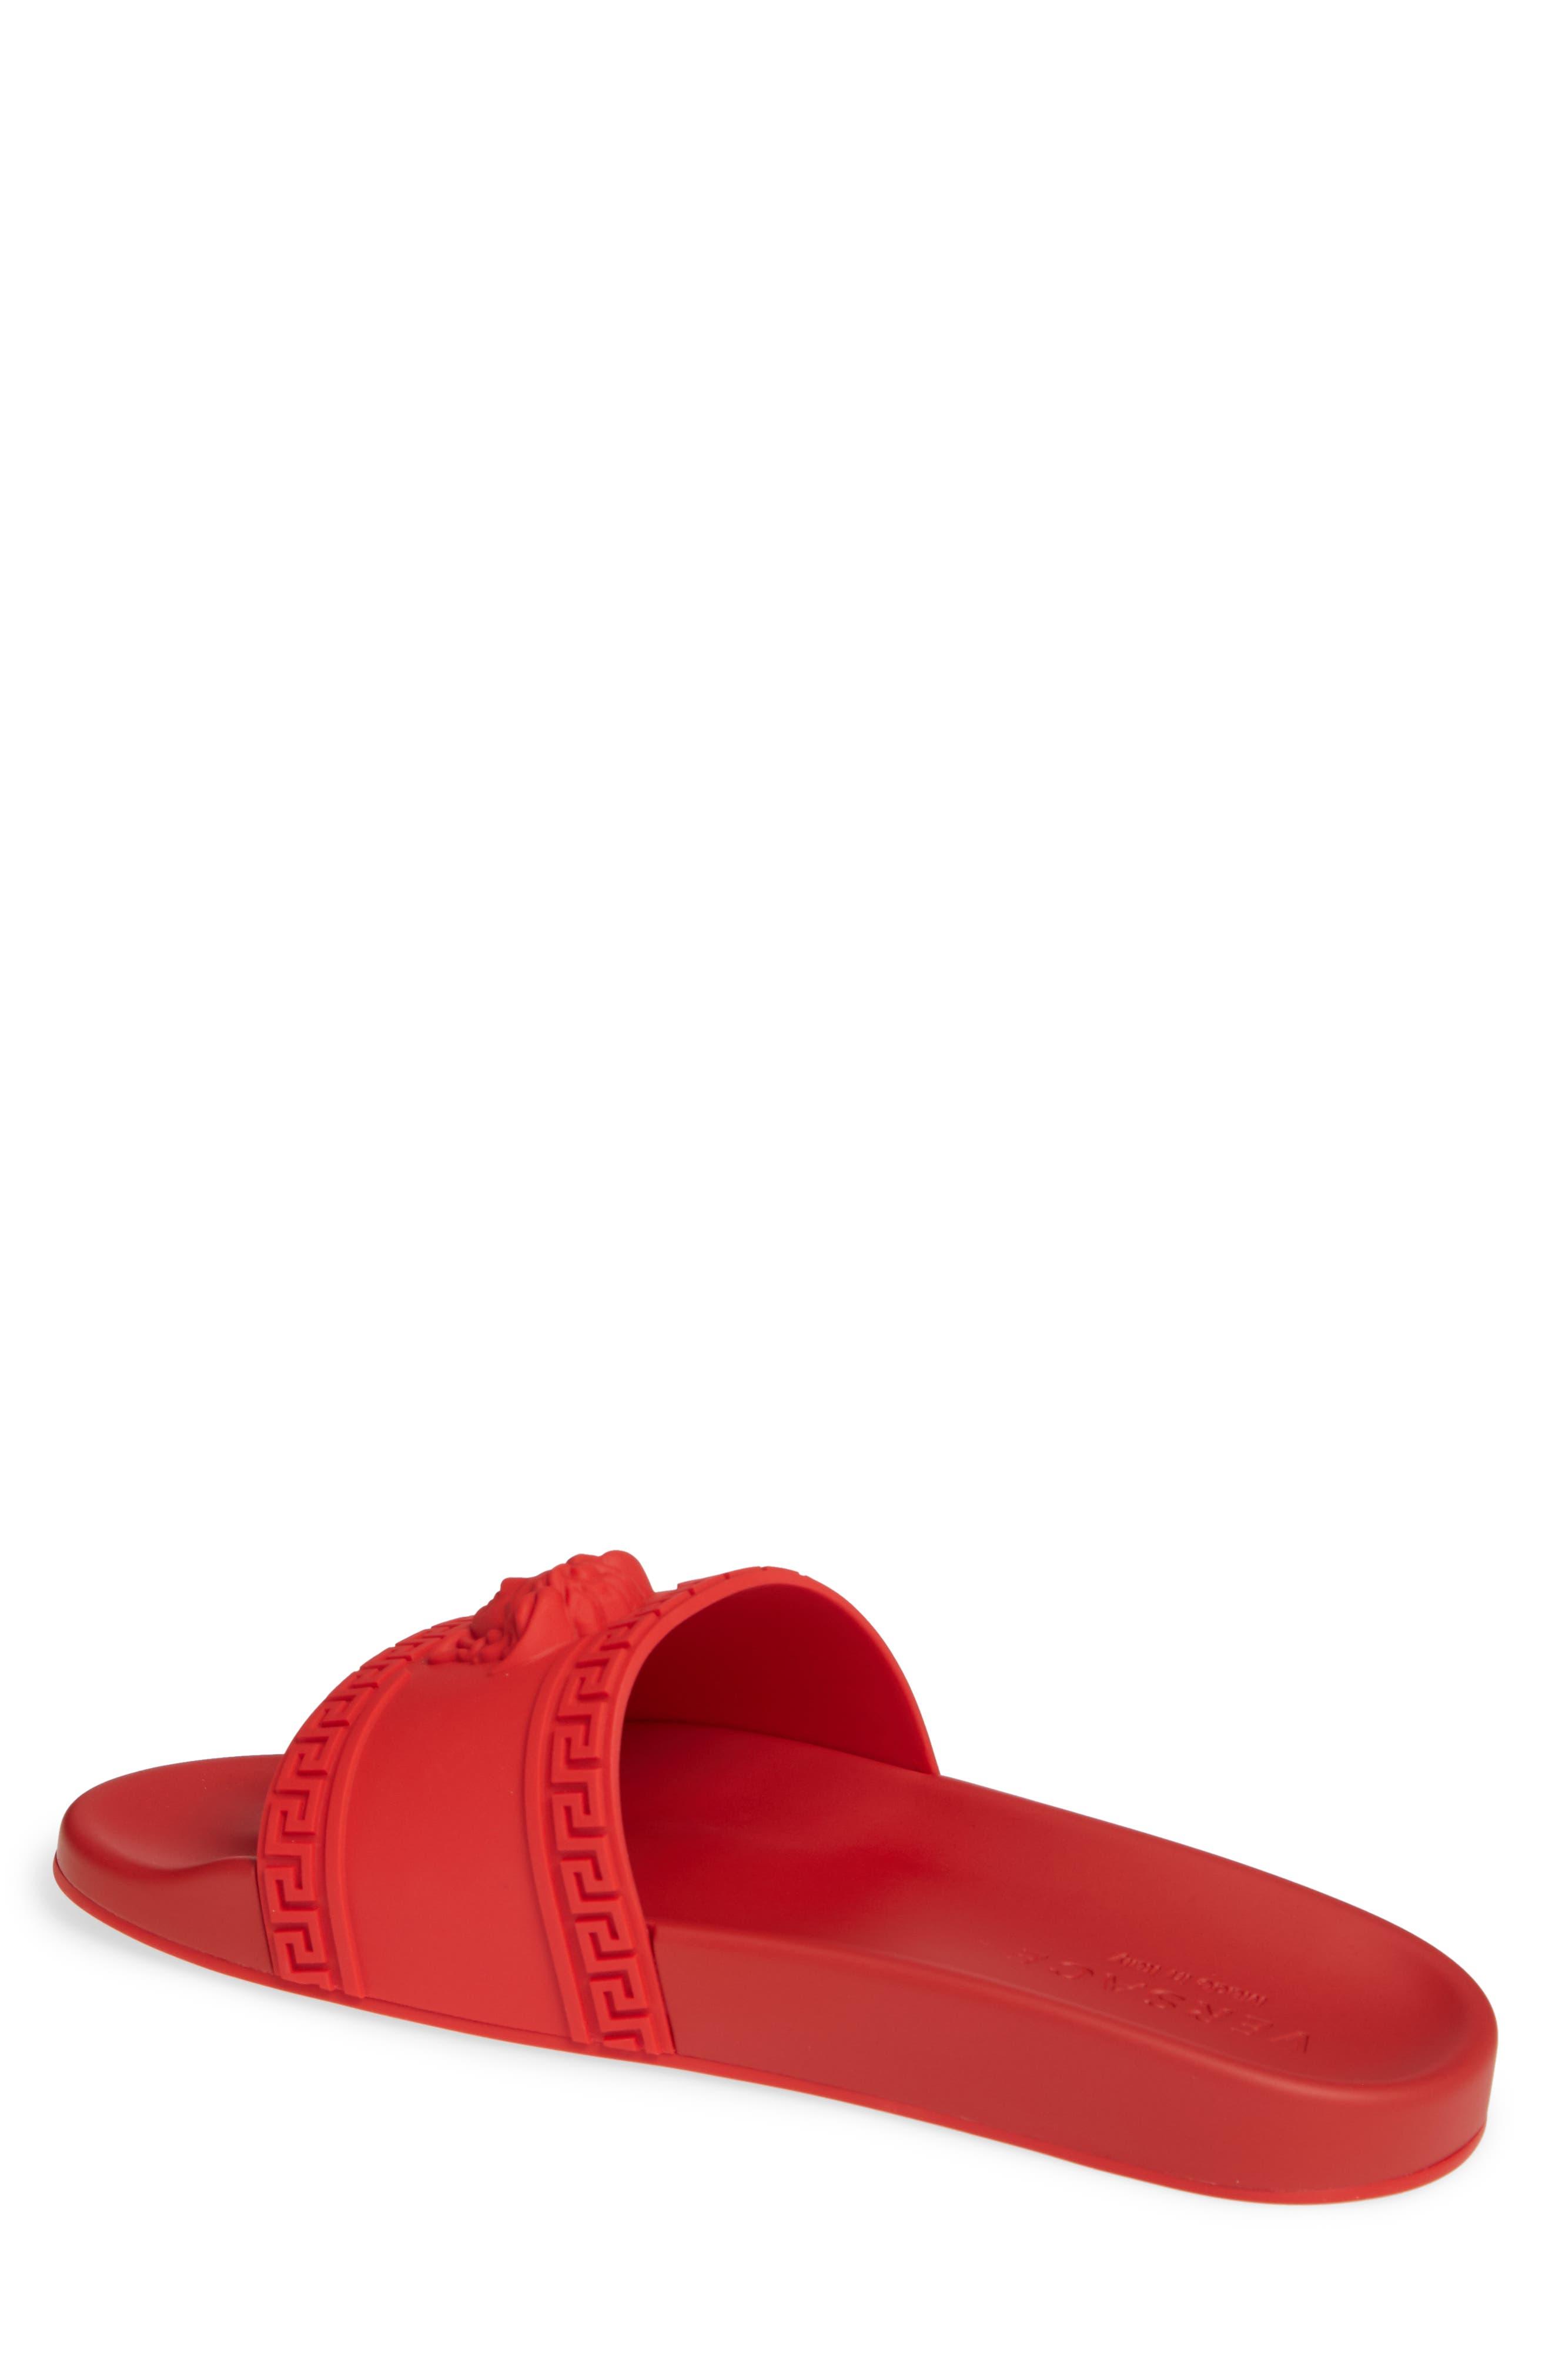 Palazzo Medusa Slide Sandal,                             Alternate thumbnail 2, color,                             RED